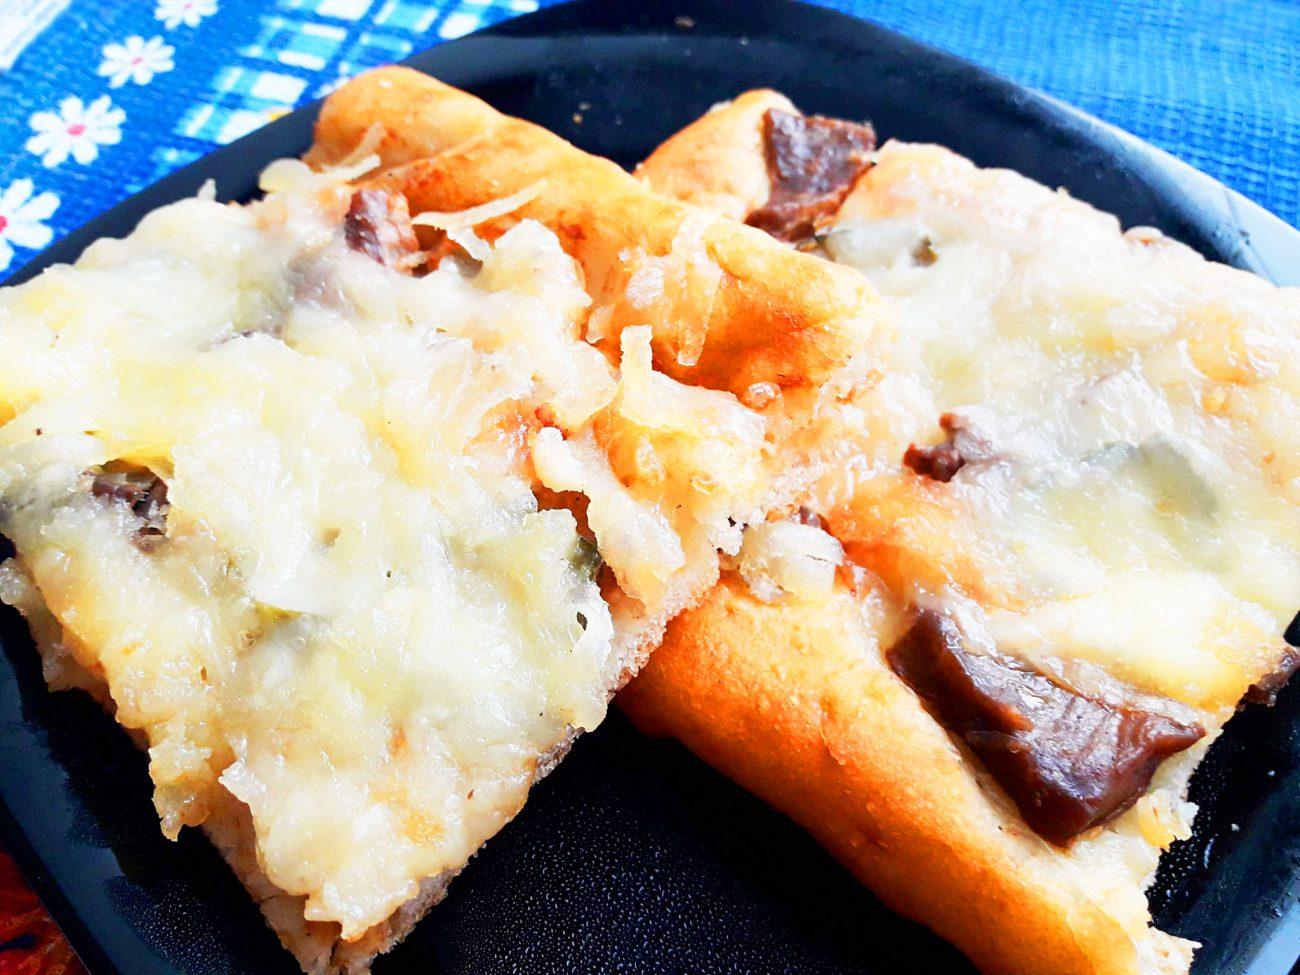 Пицца на дрожжевом тесте с мясом